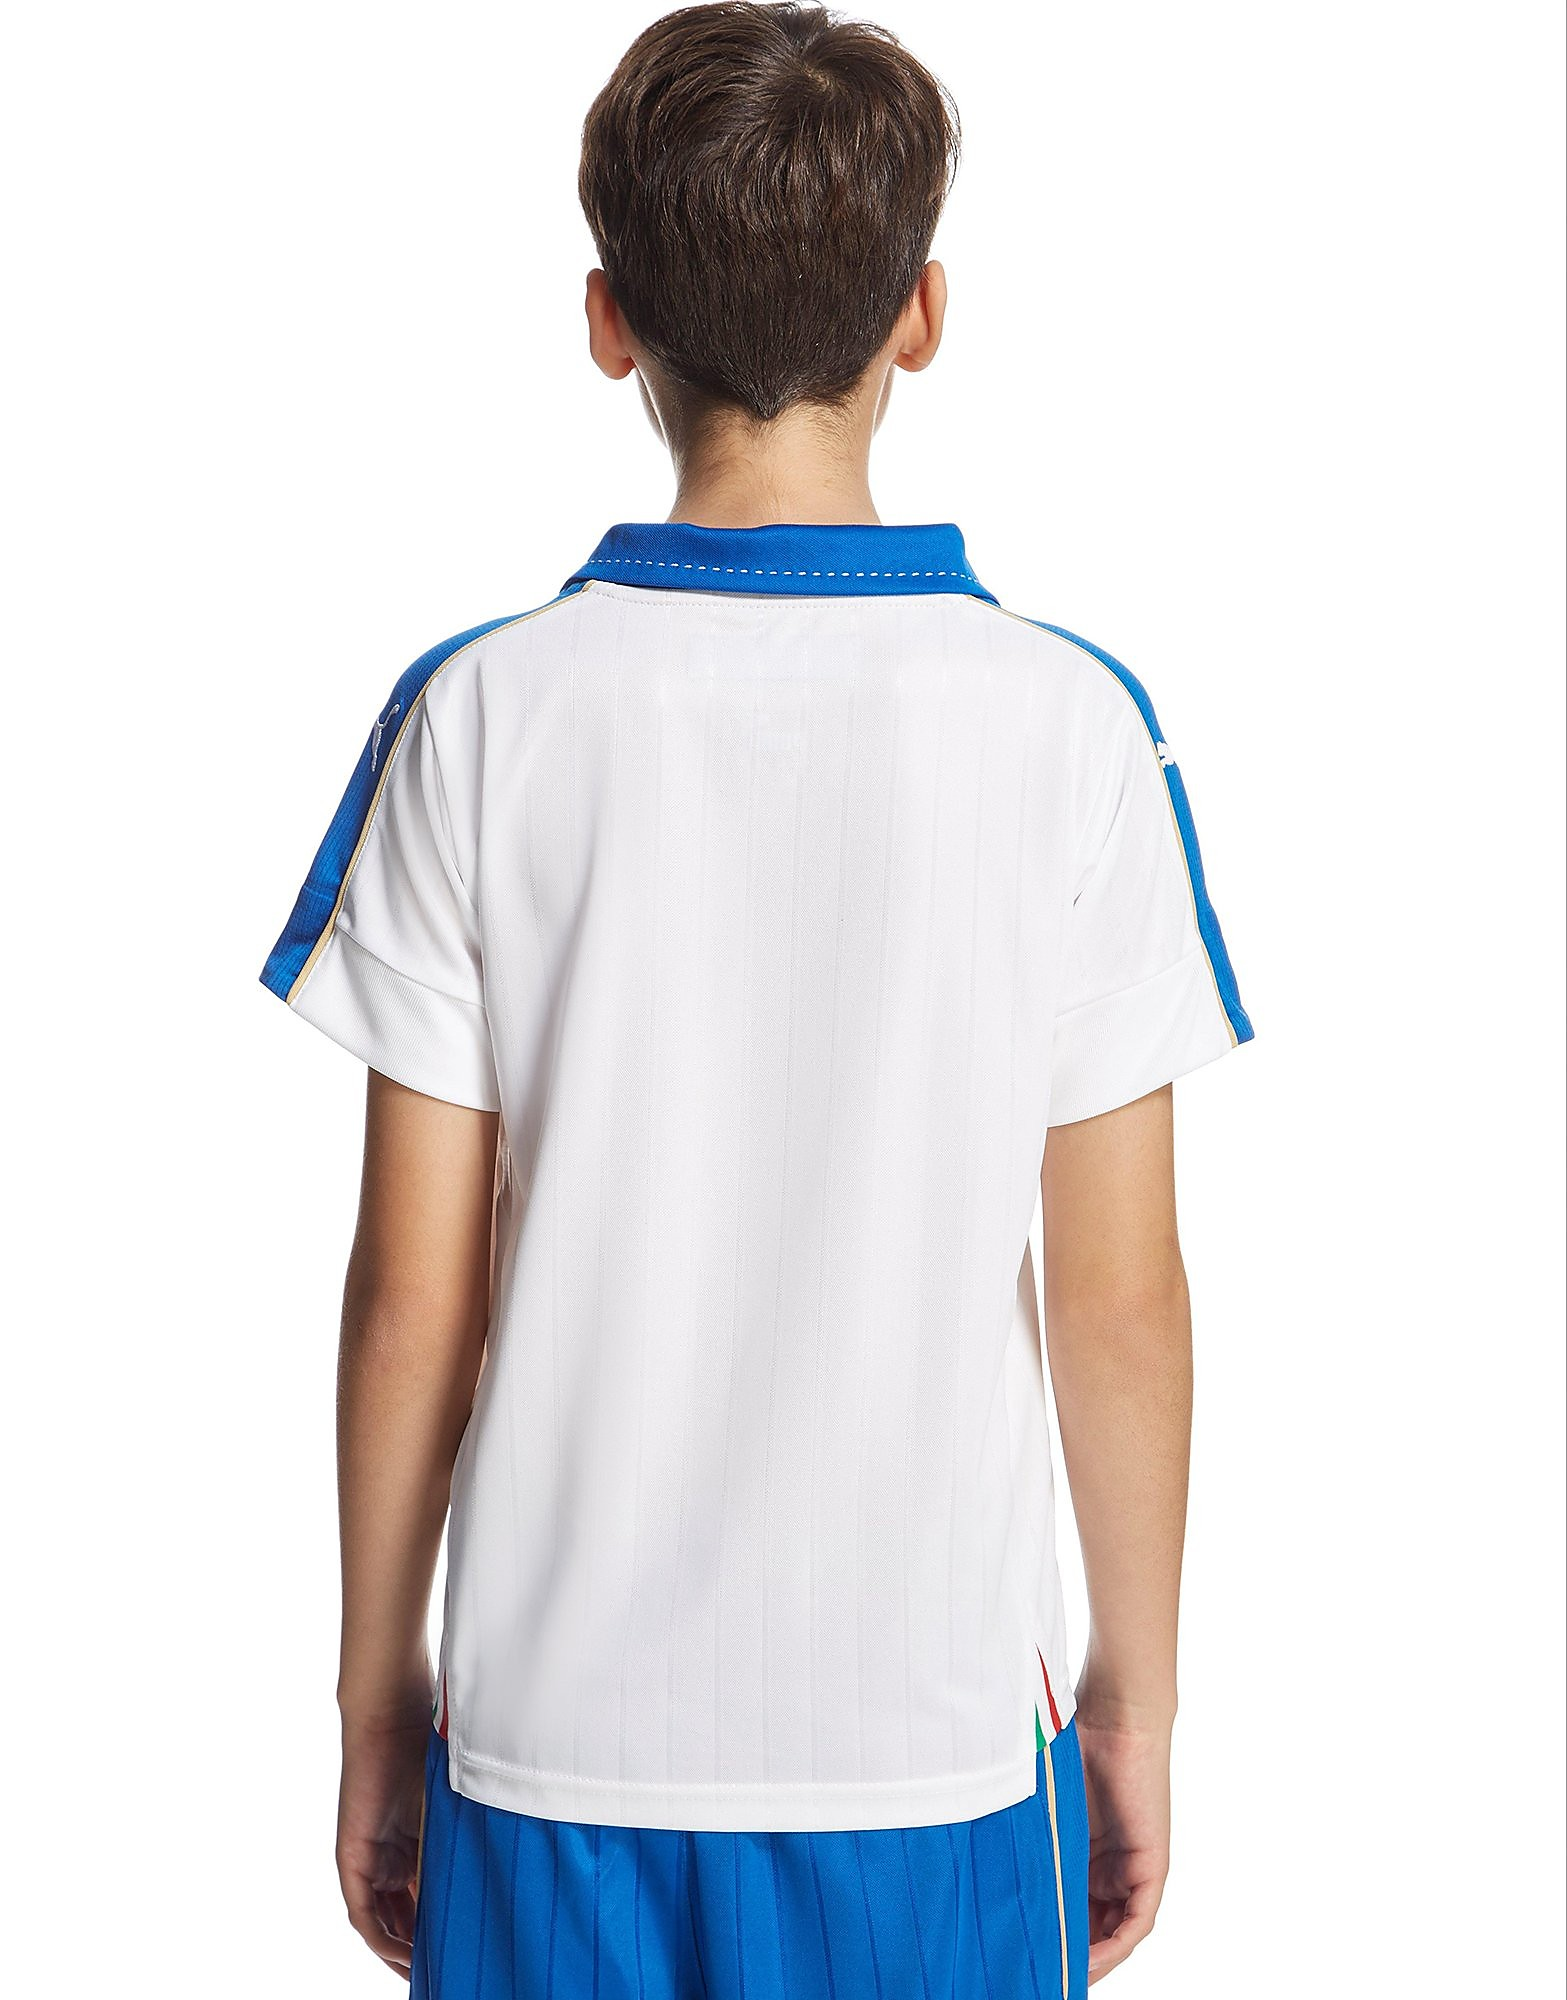 PUMA Italy Away 2016 Shirt Junior